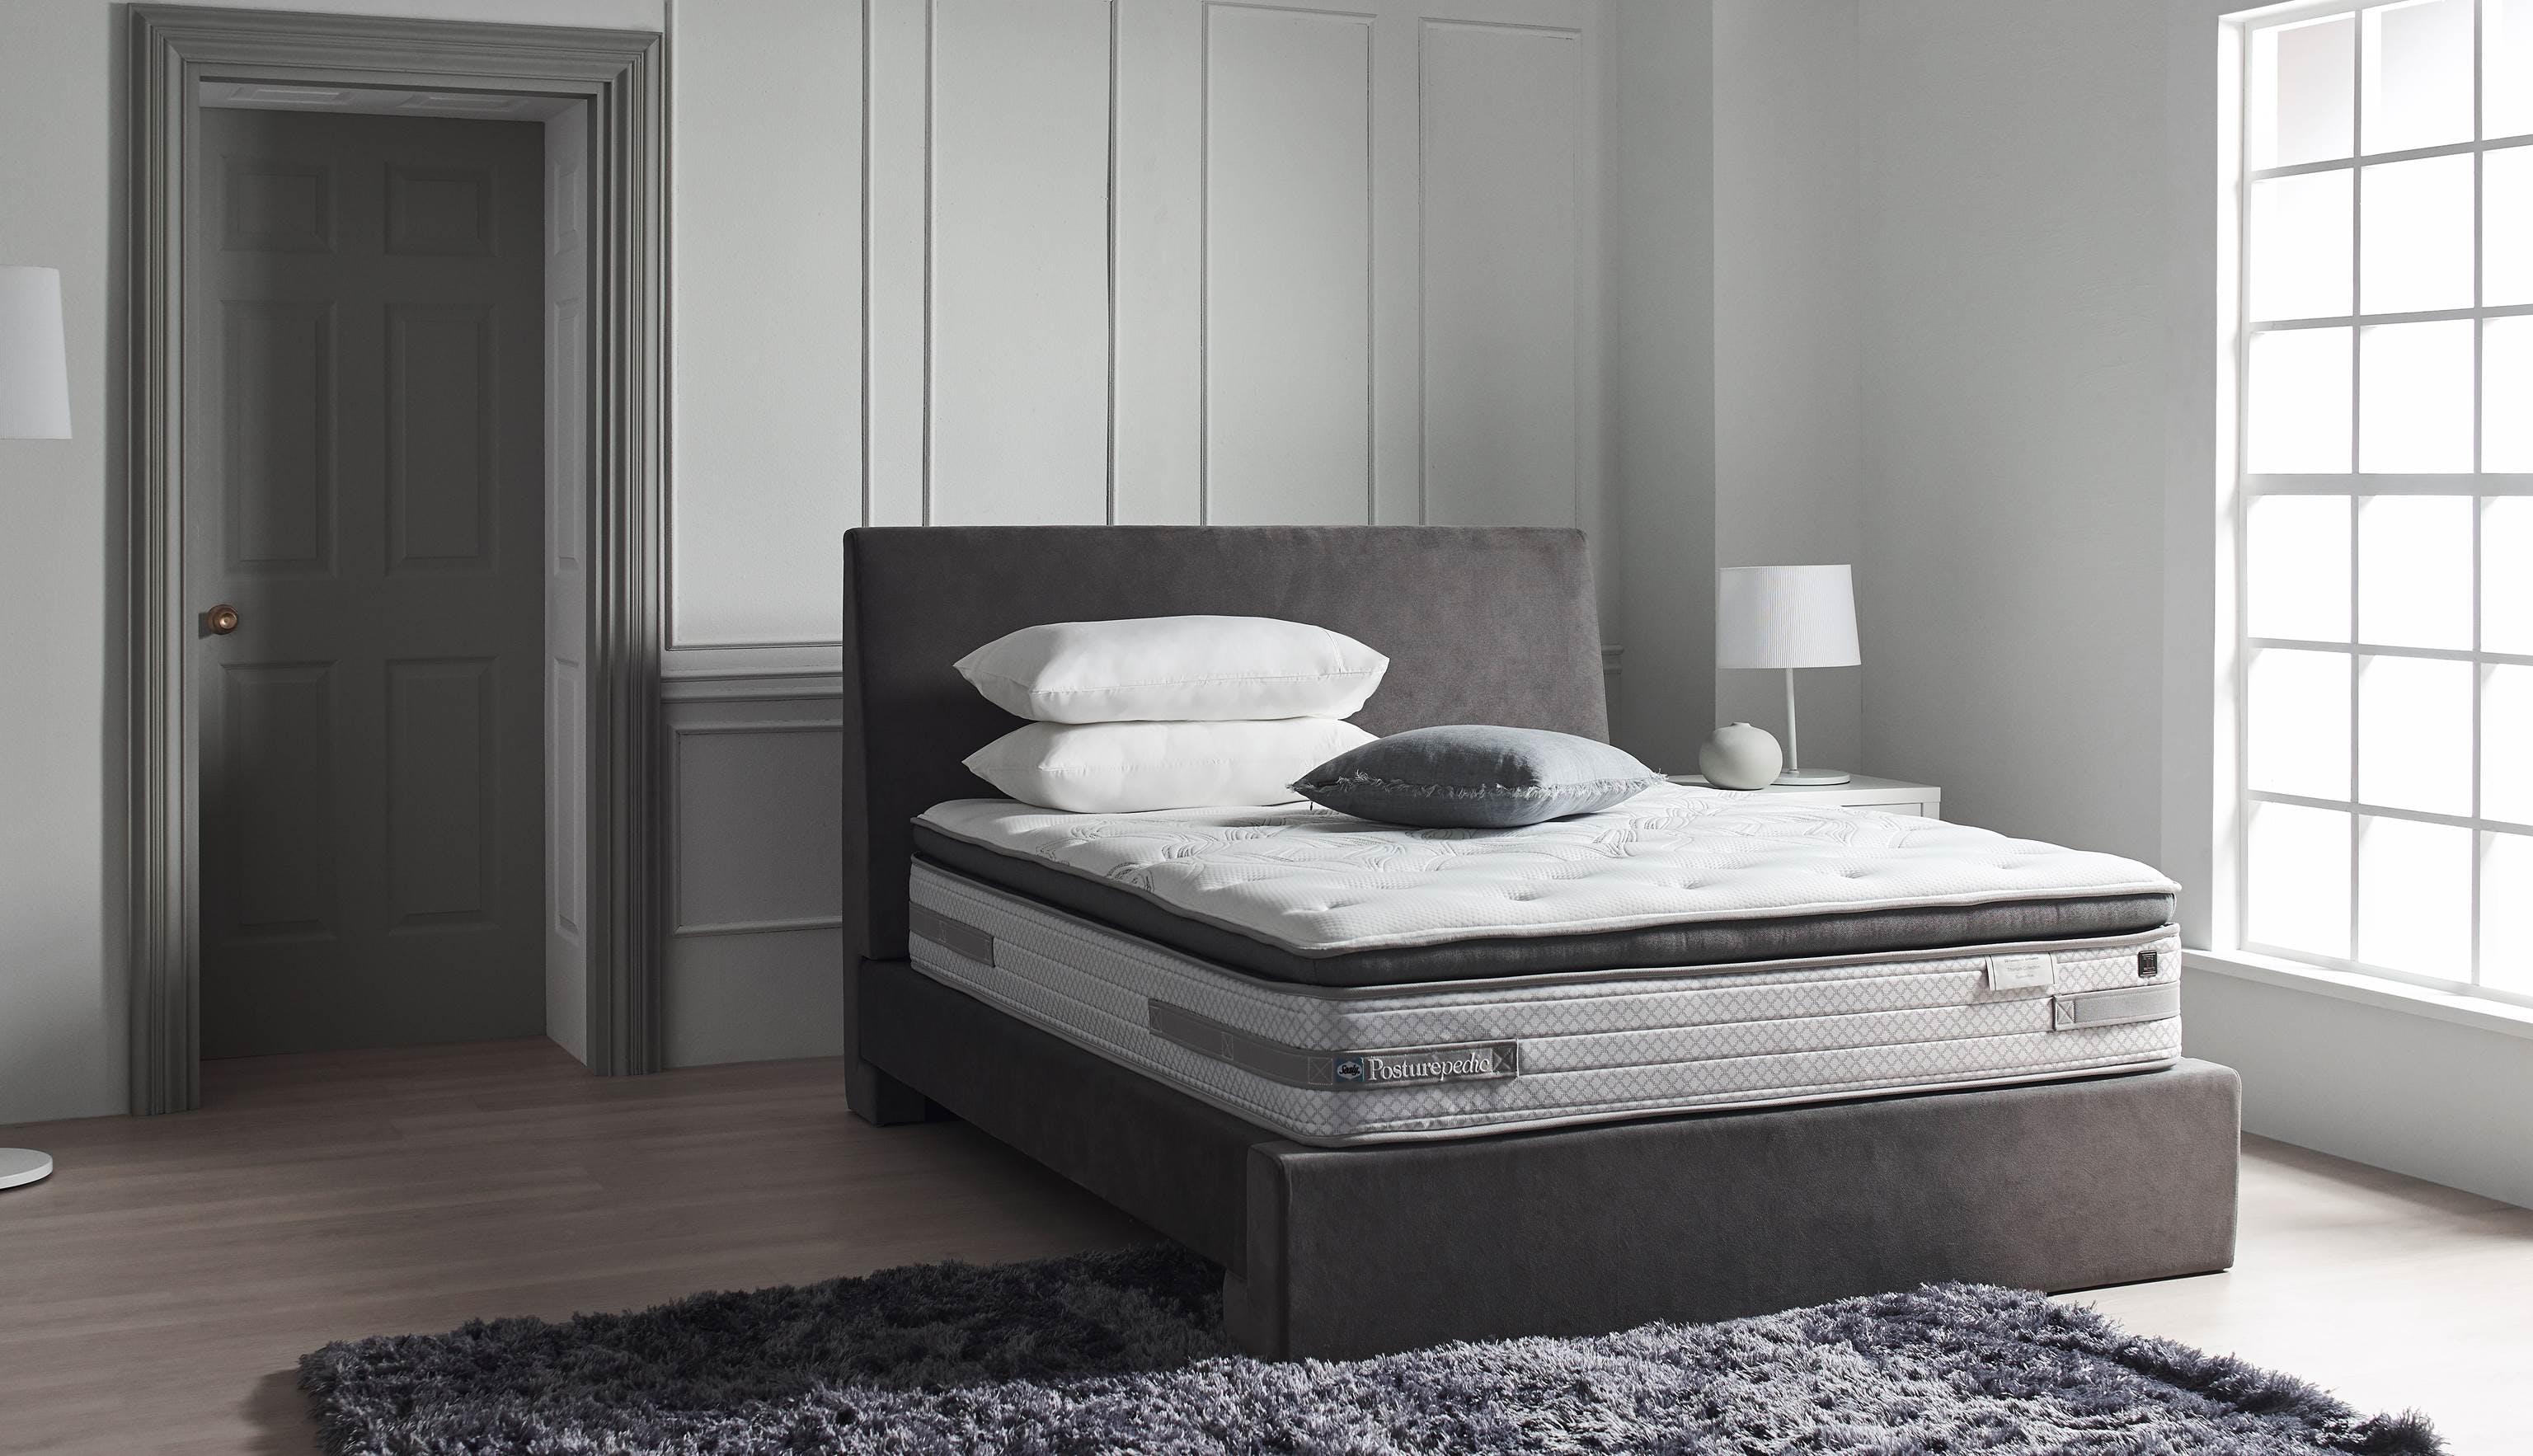 Sealy Posturepedic Anium Cushion Firm Mattress Queen Size Harvey Norman Singapore